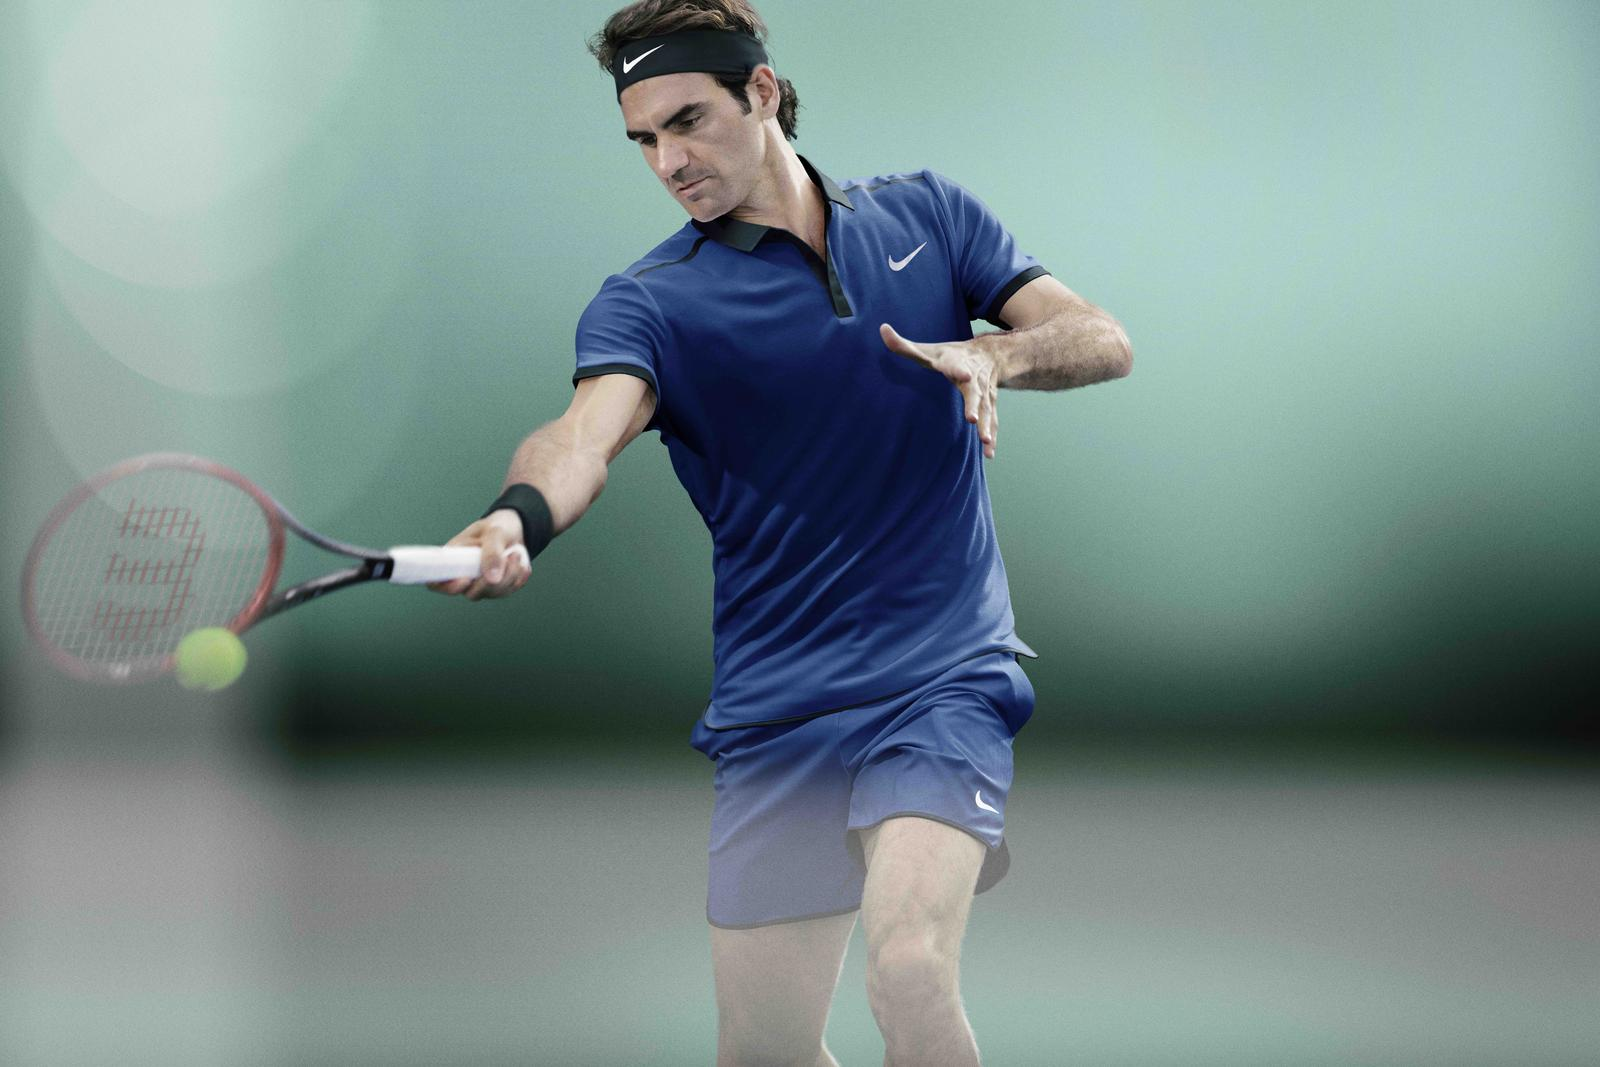 Roger Federer tenue nike roland-garros 2016 polo bleu tennis